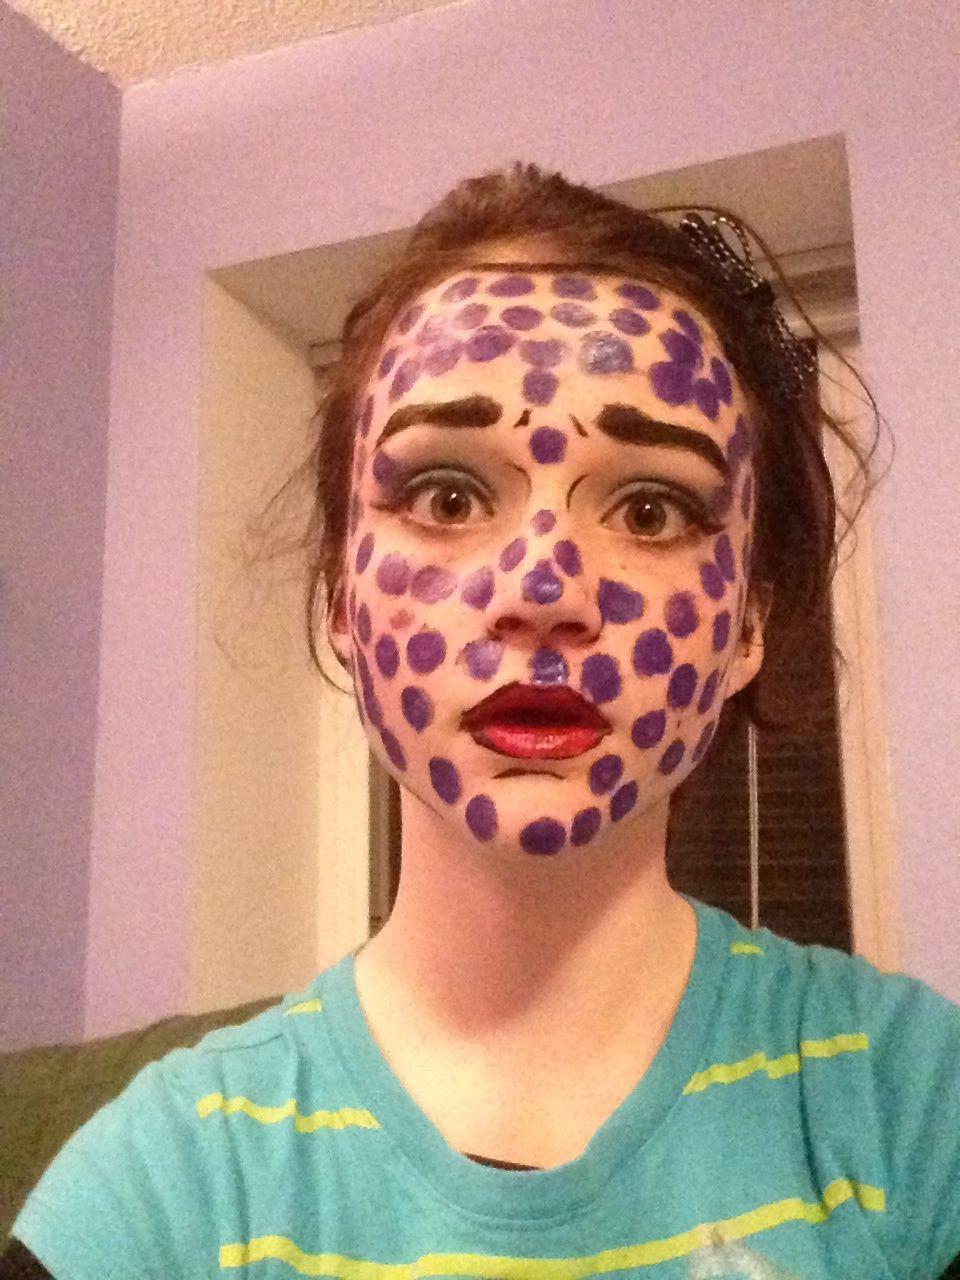 Dot comic makeup attempt